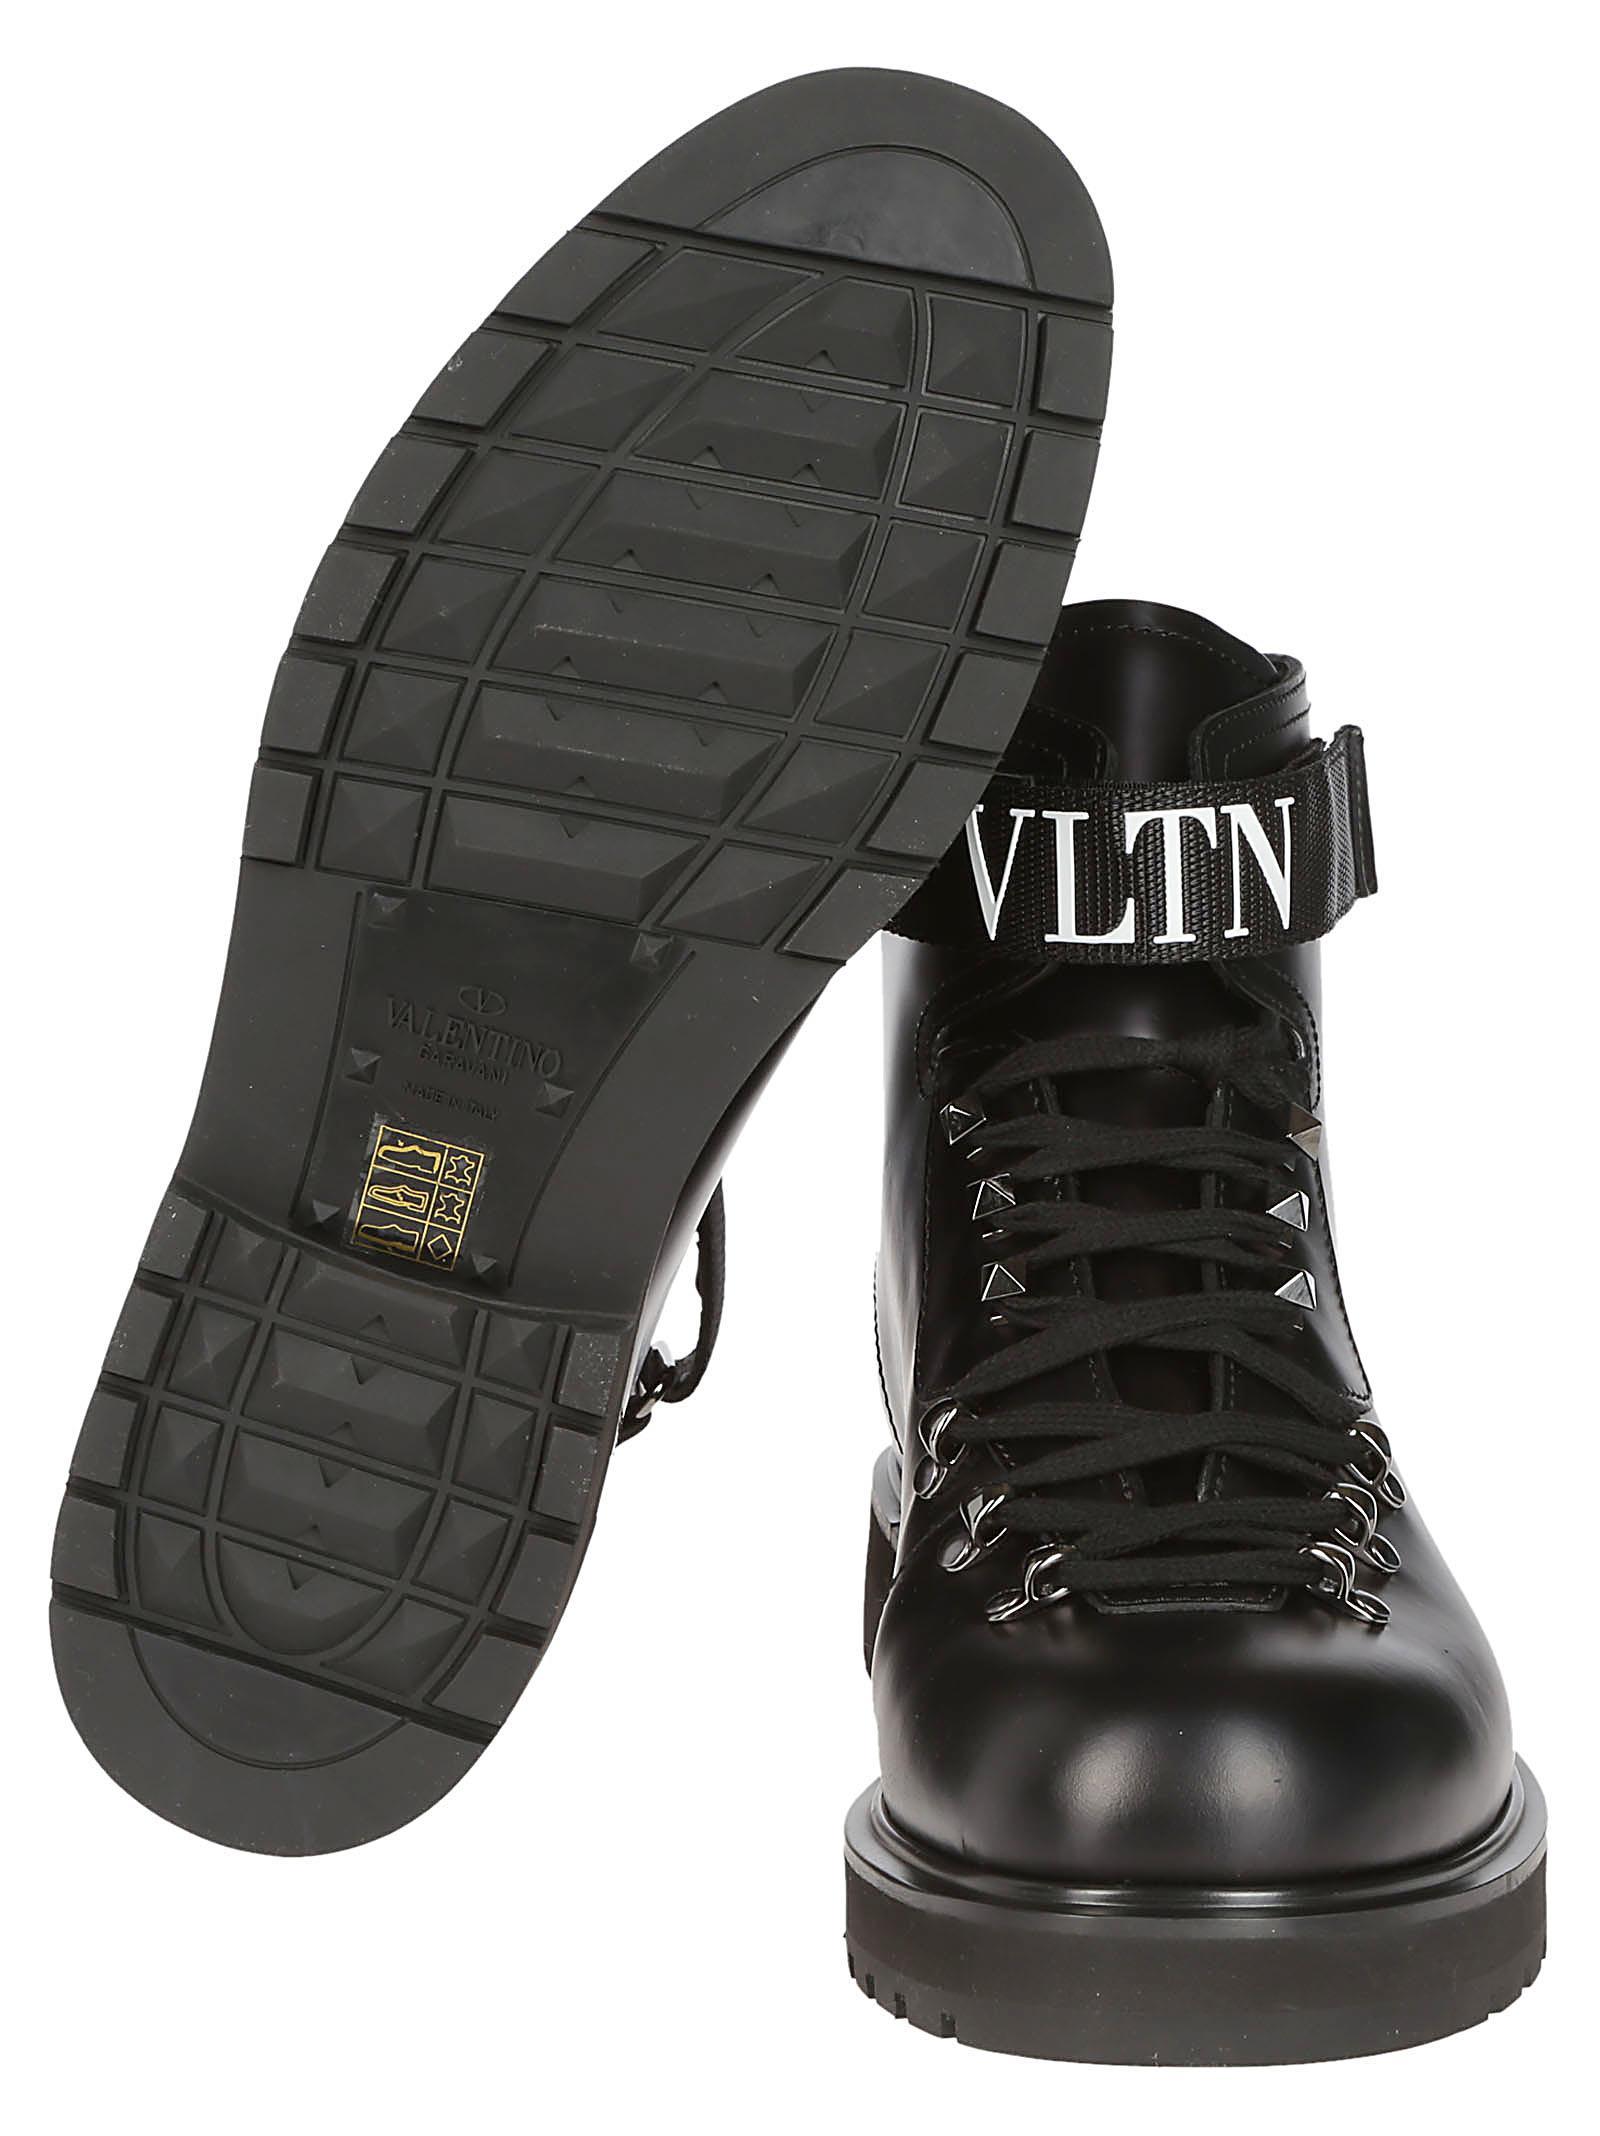 89df97b2e5a Valentino Garavani Valentino Garavani Vltn Lace-up Boots - Black ...